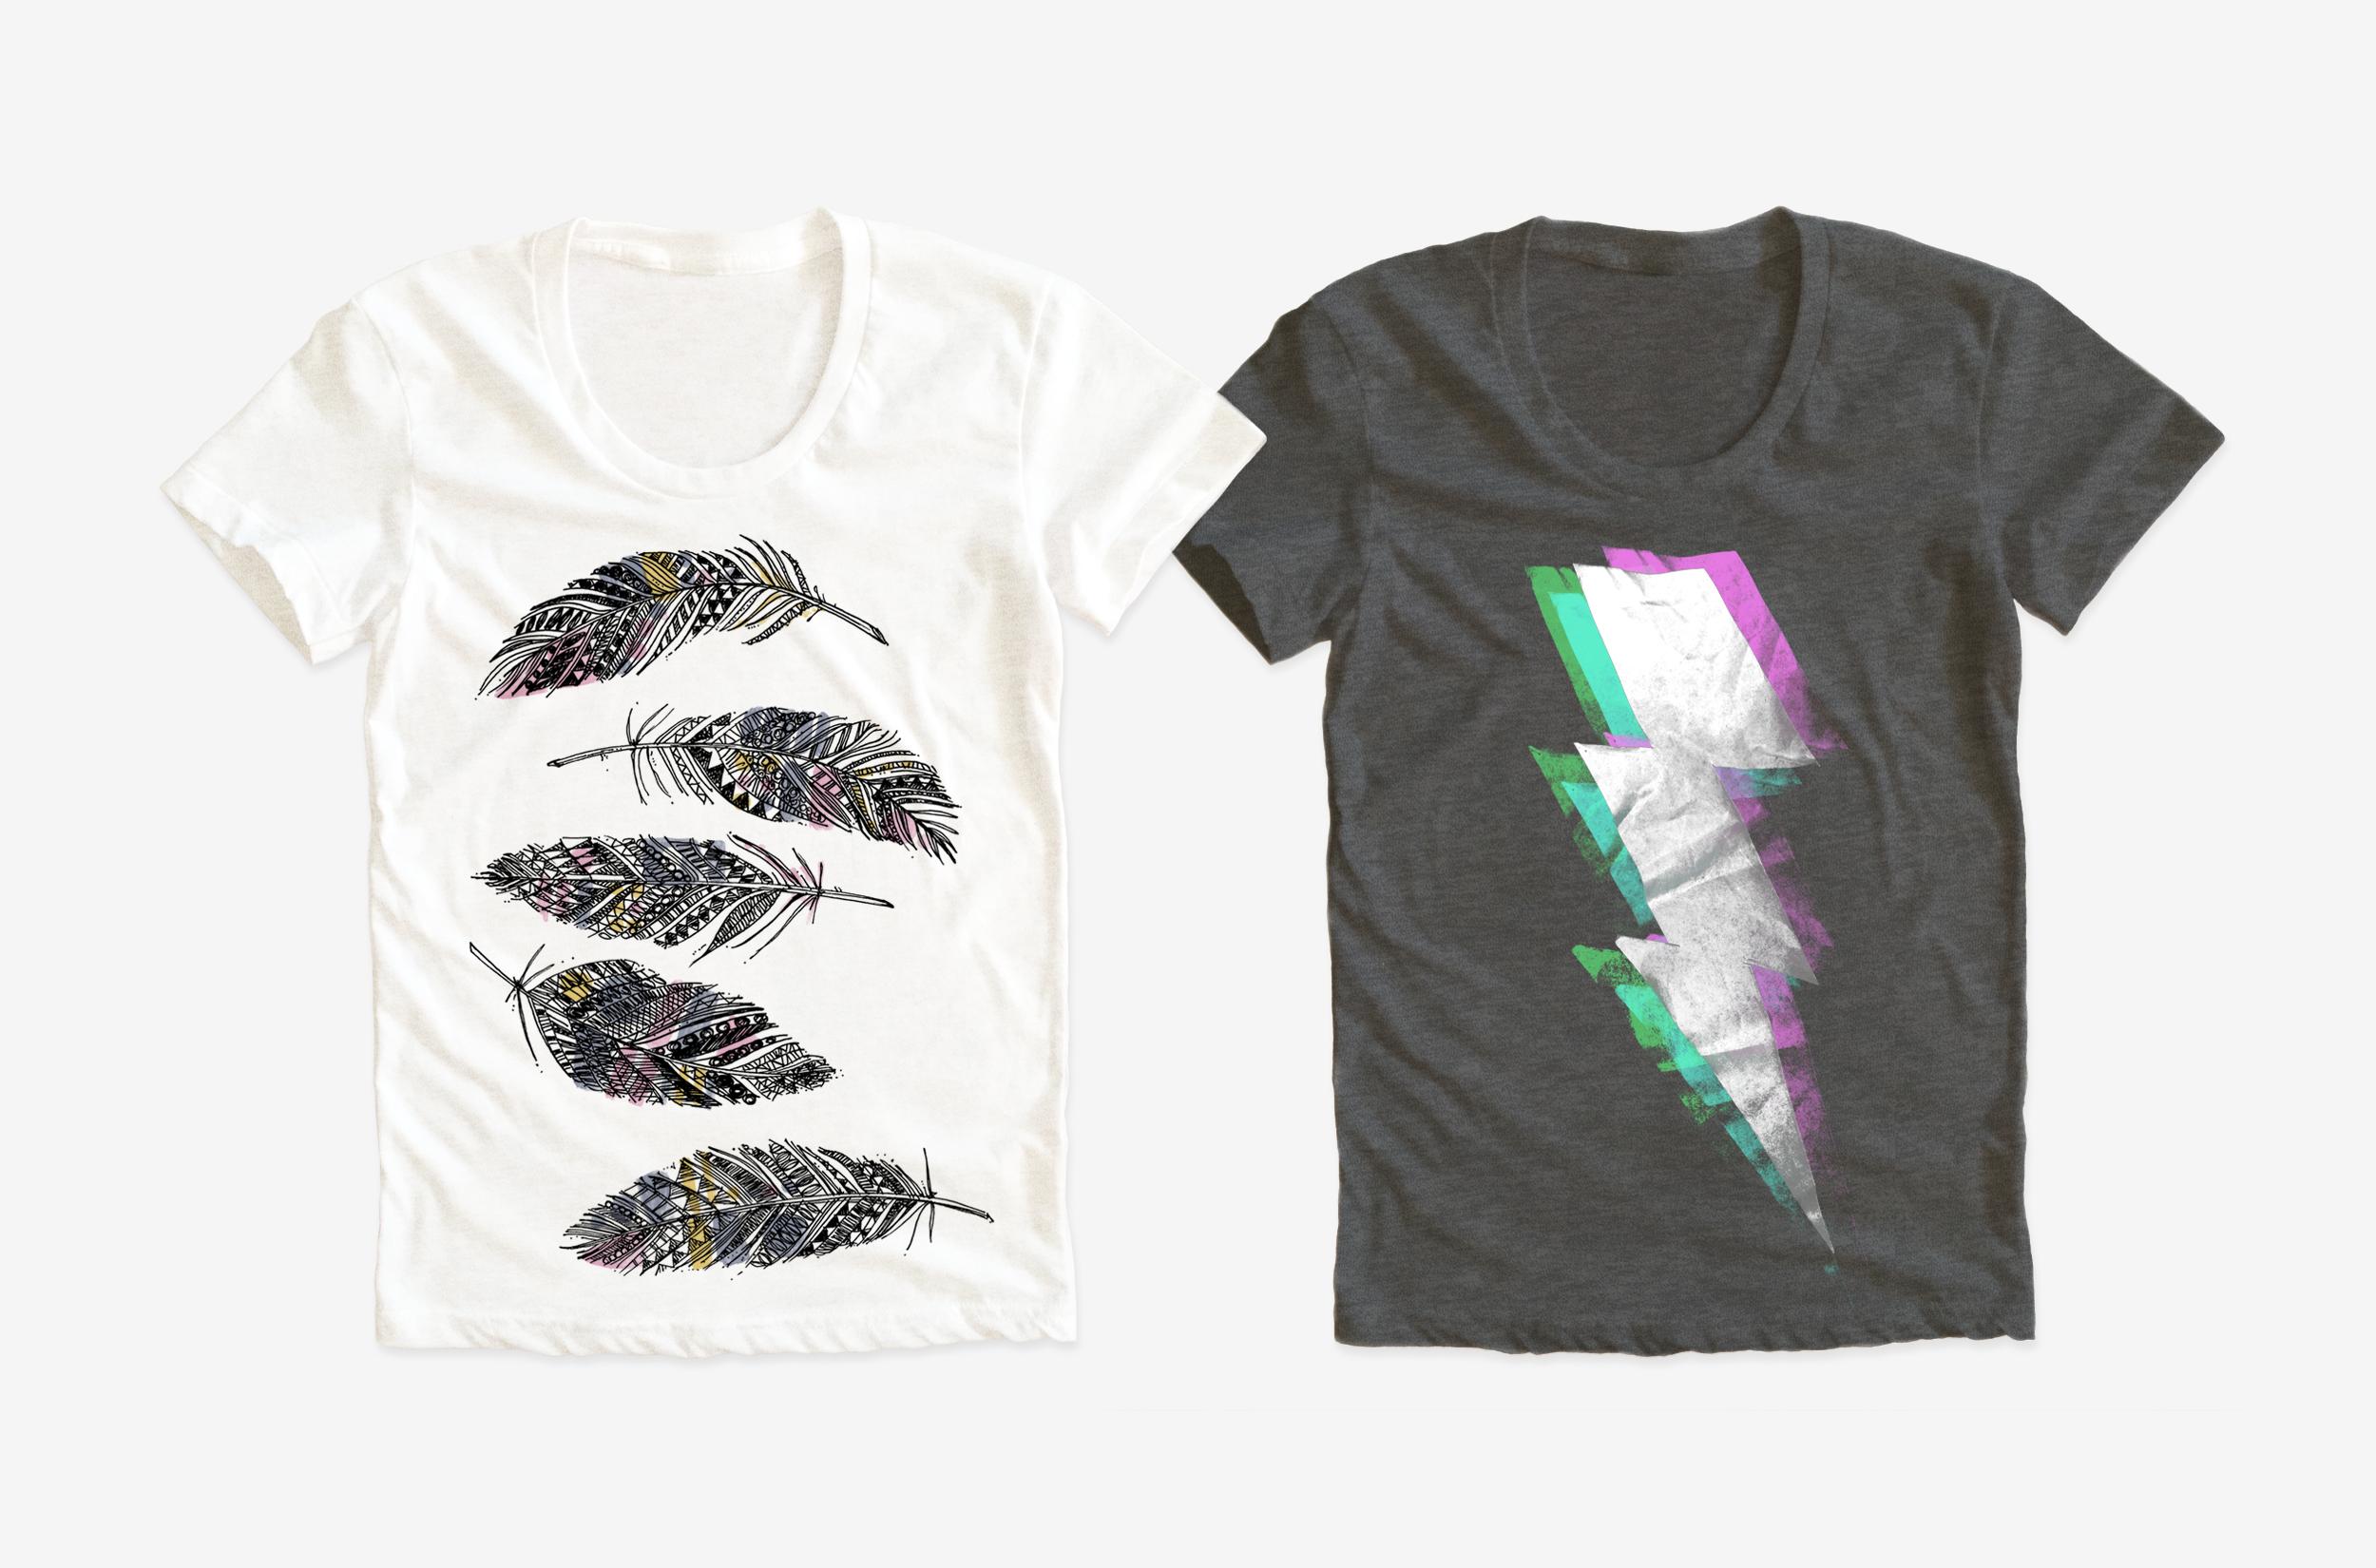 CONVERSE / Womens t-shirt graphics